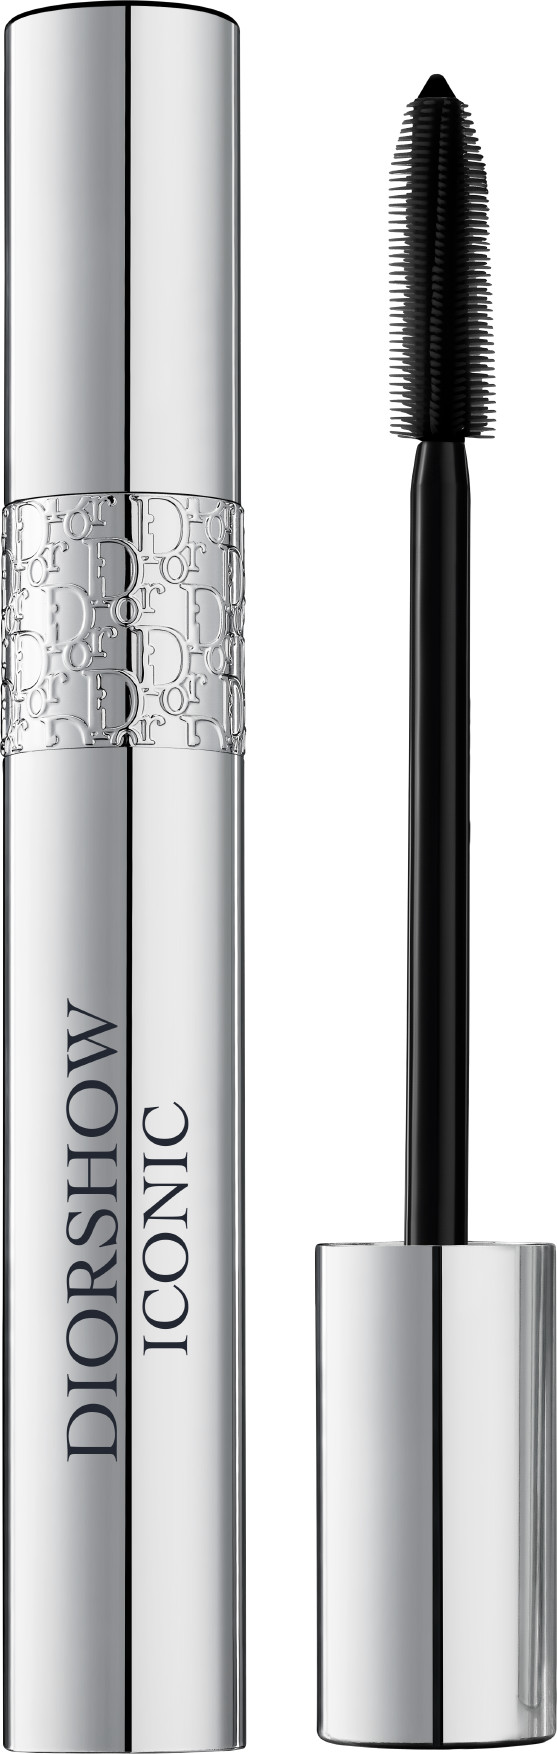 Dior Diorshow Iconic 10ml - 090 Black